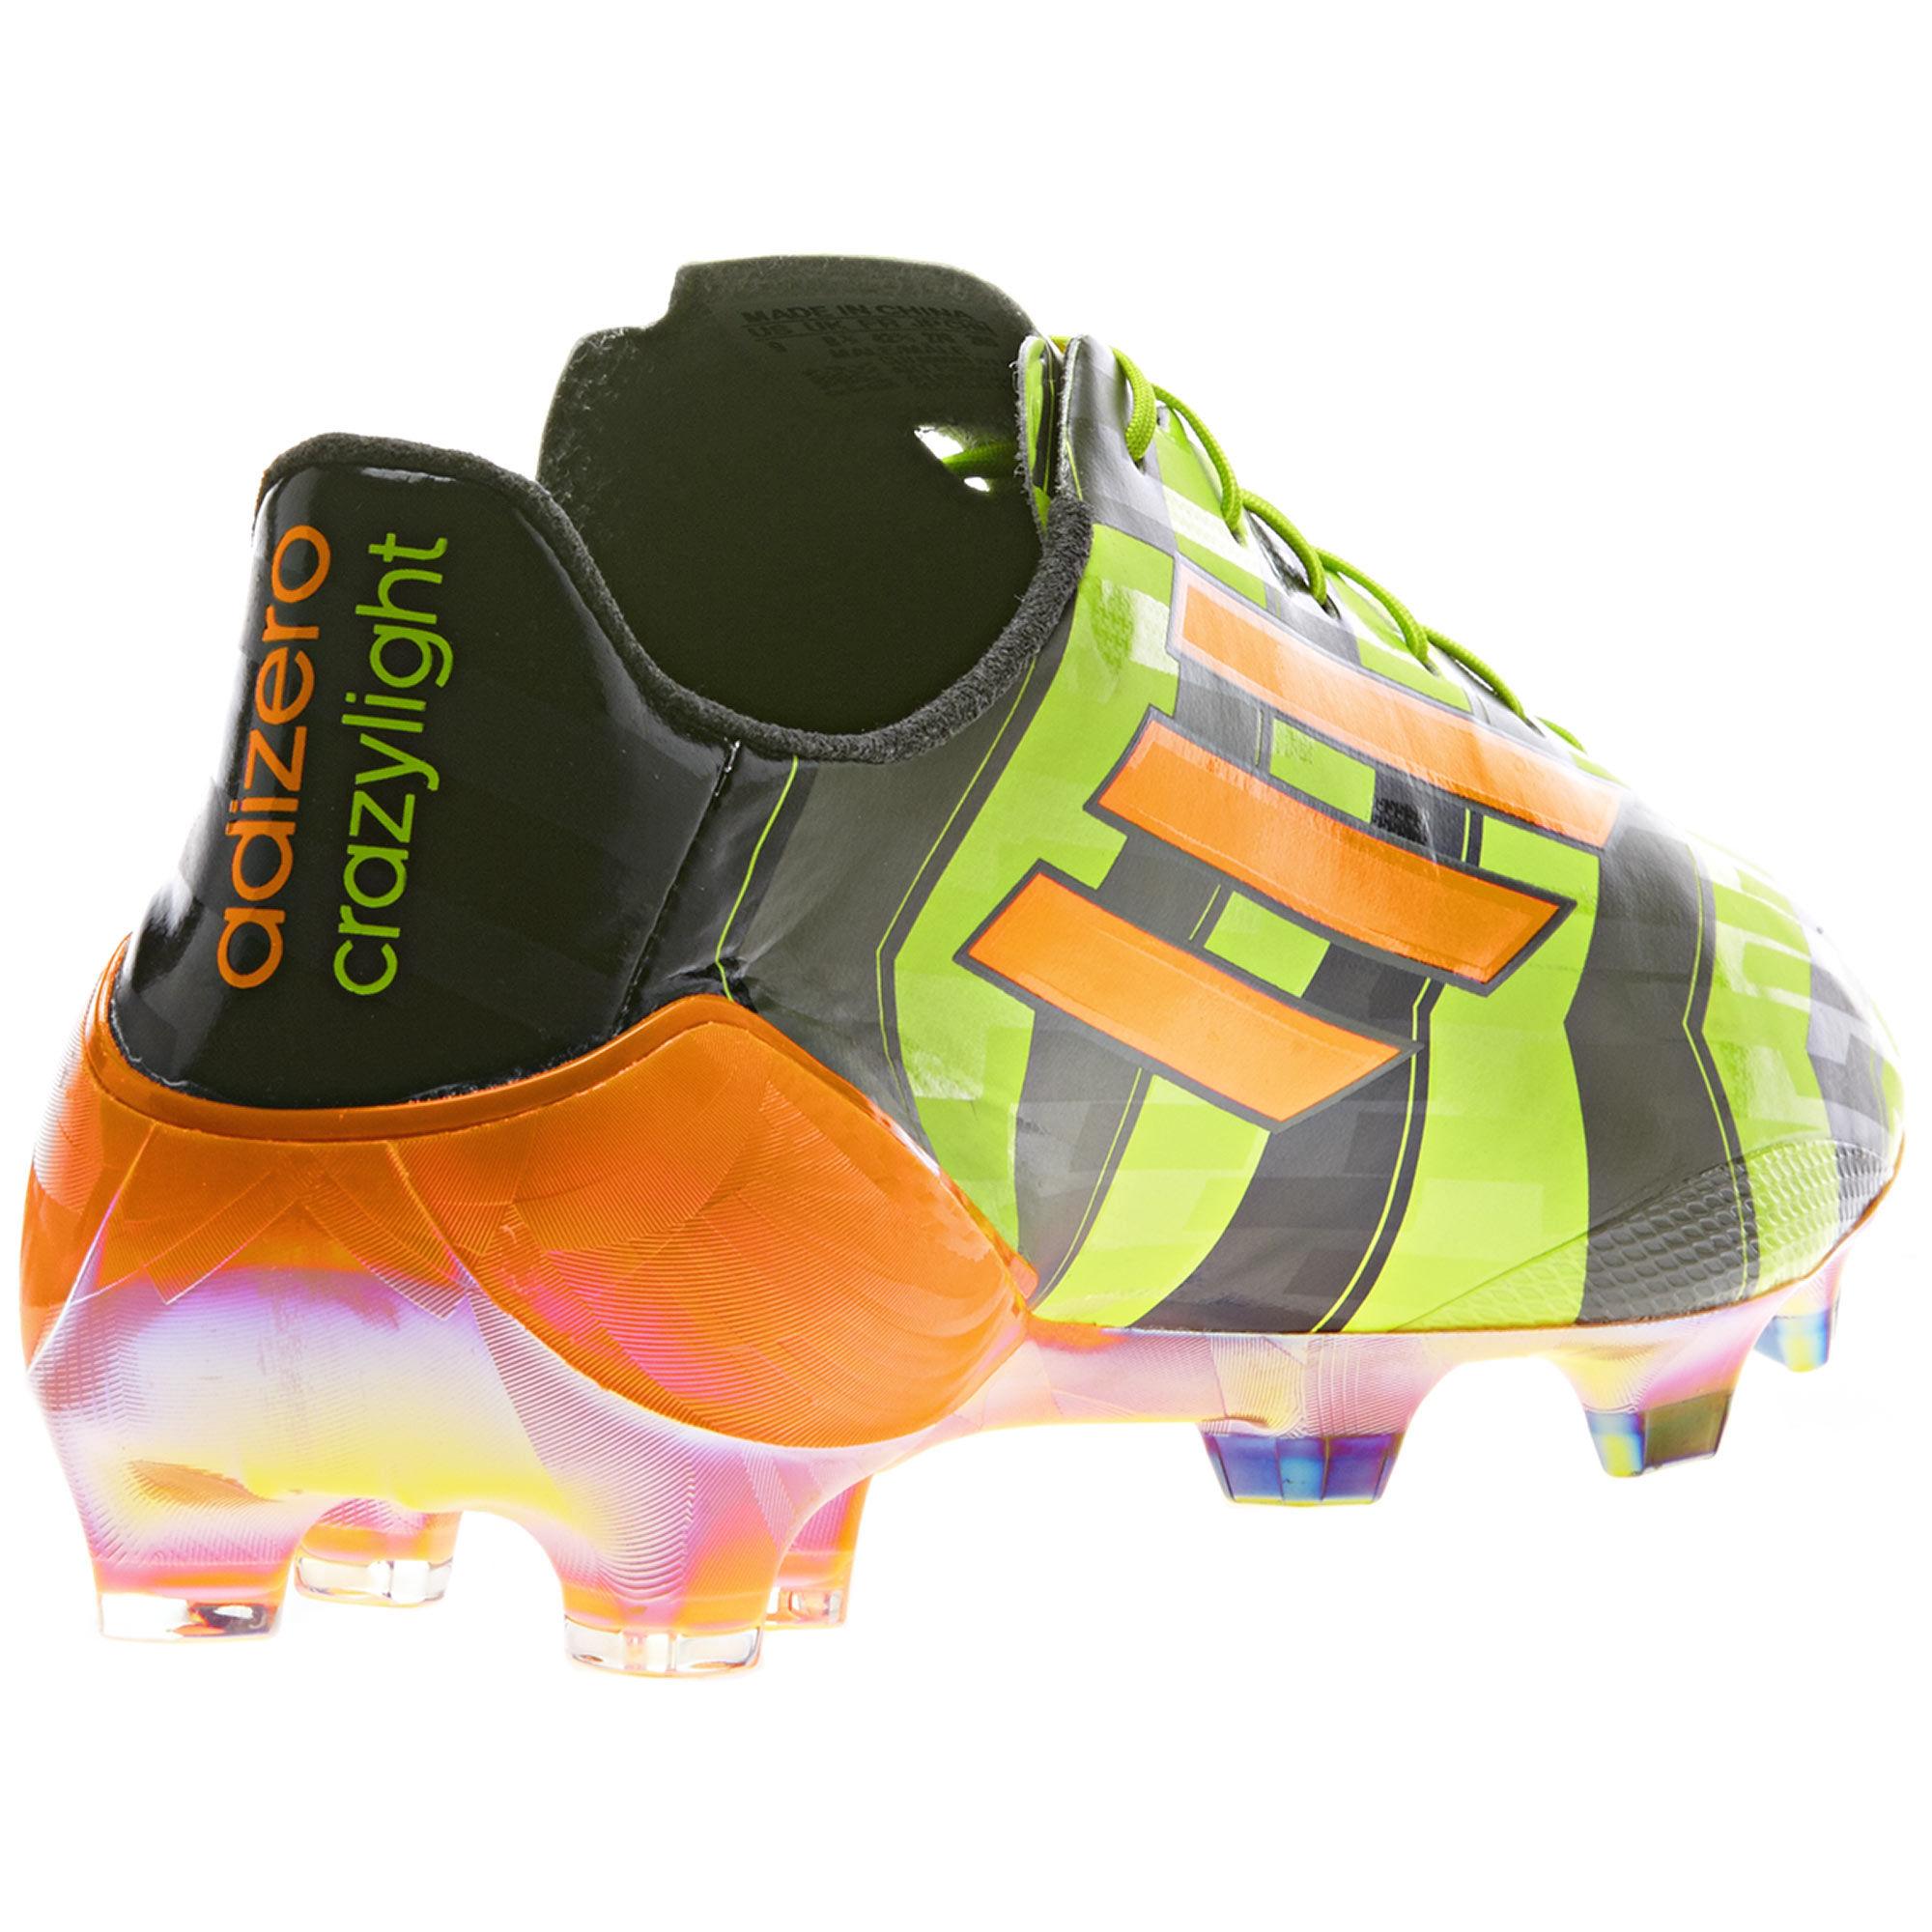 Adidas F50 Adizero Crazylight Trx Fg Boots Solar Slime